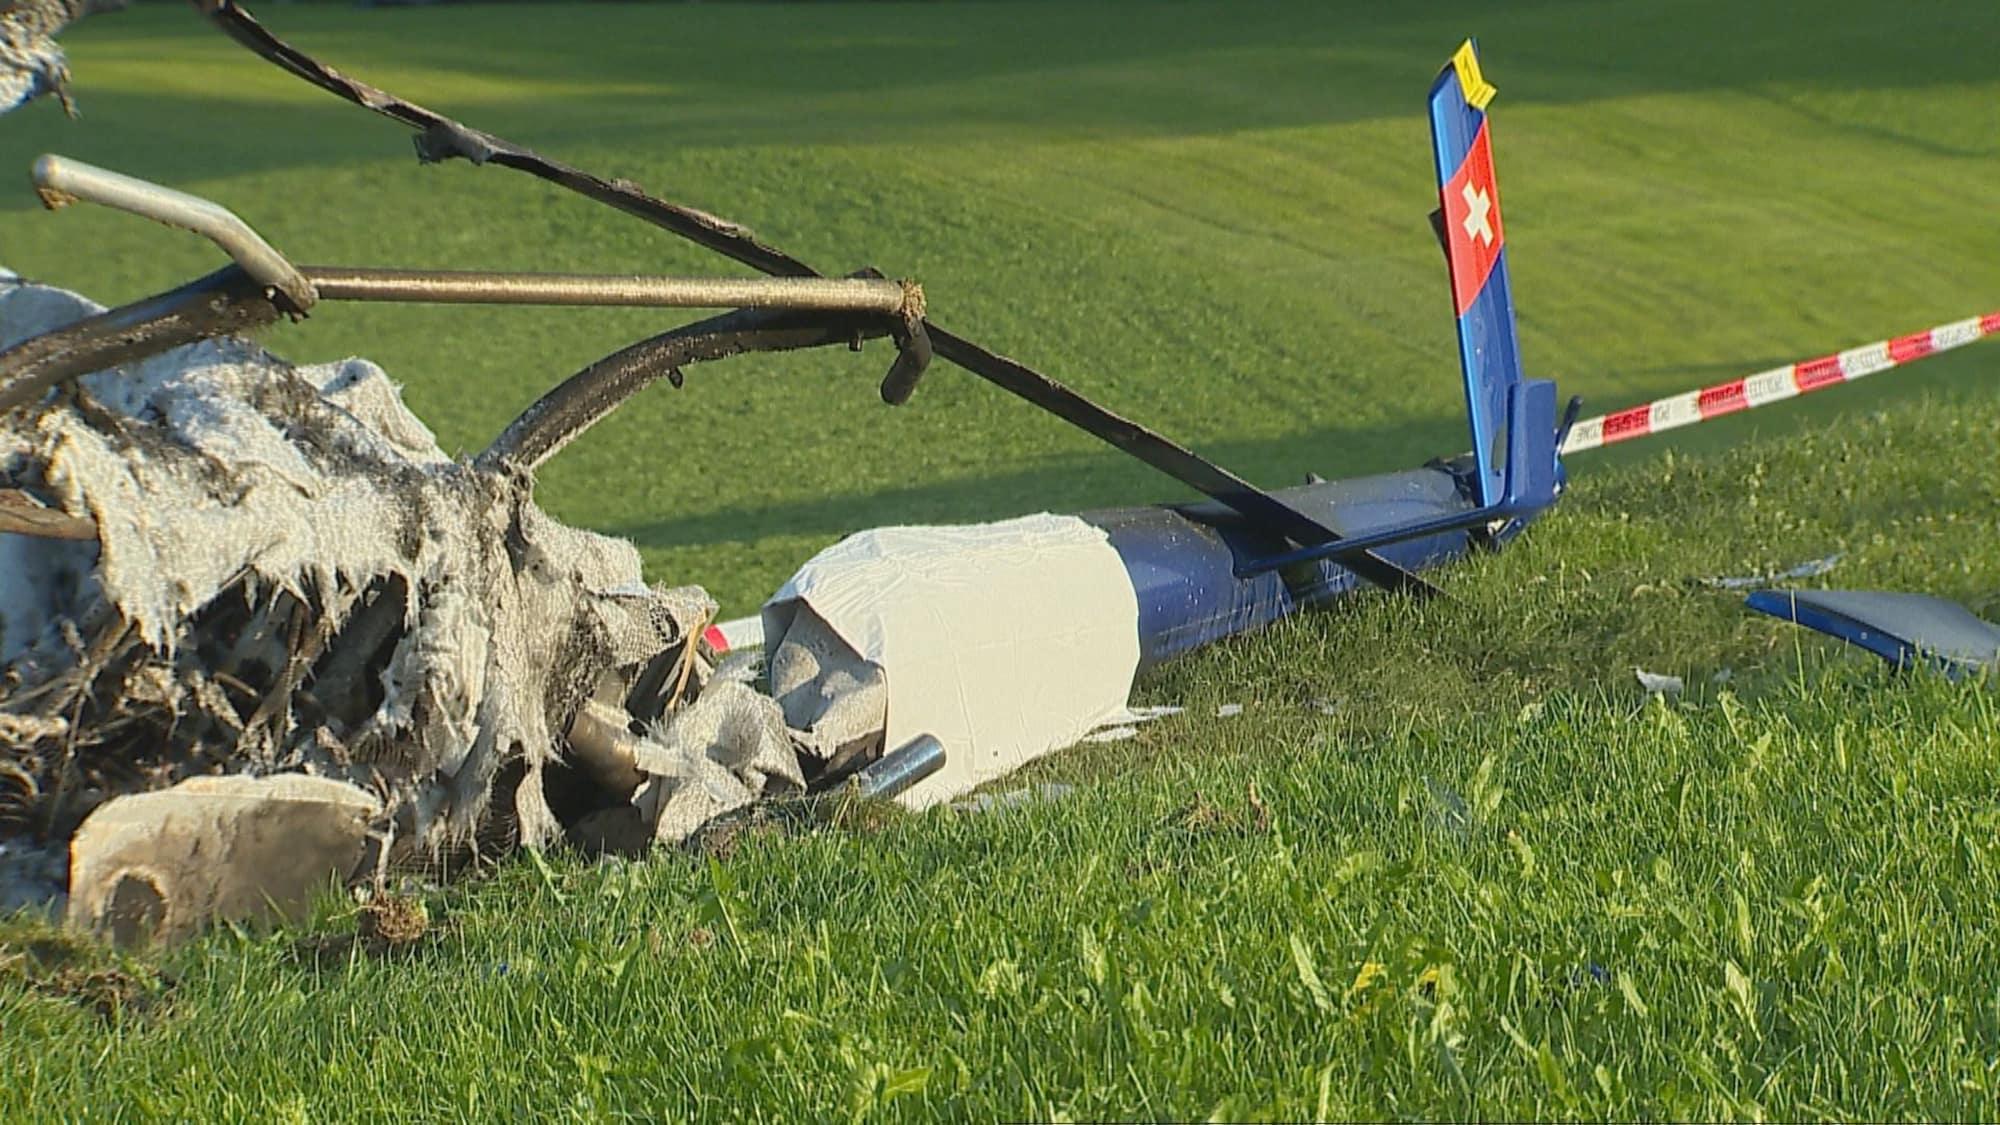 Helikopter-Absturz bei Herisau: Mann (†59) tot, Frau (56) schwer verletzt